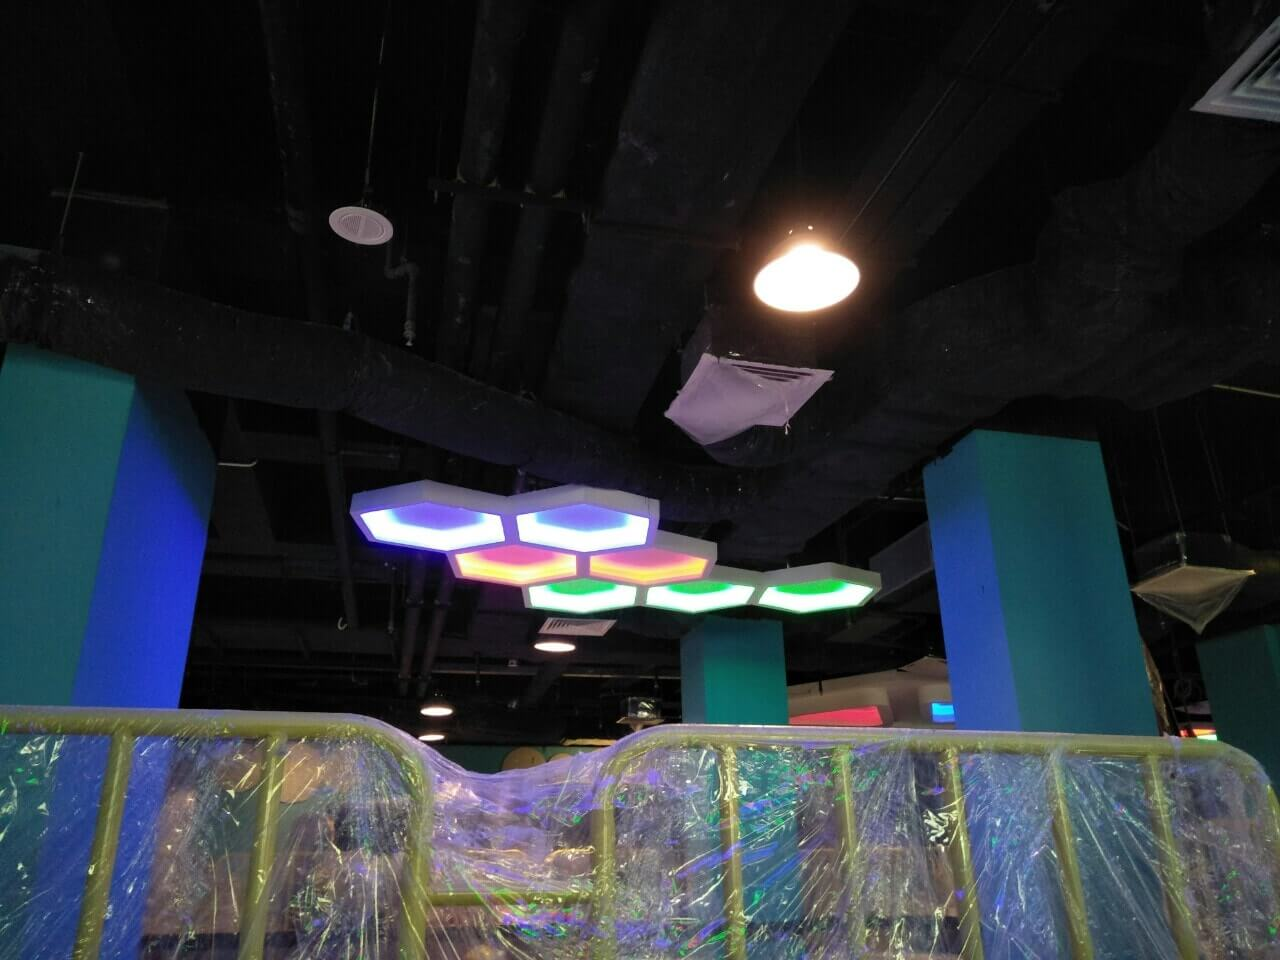 GOADESIGN Thiết Kế Khu Vui Chơi Garden Mall - Q5 (18)